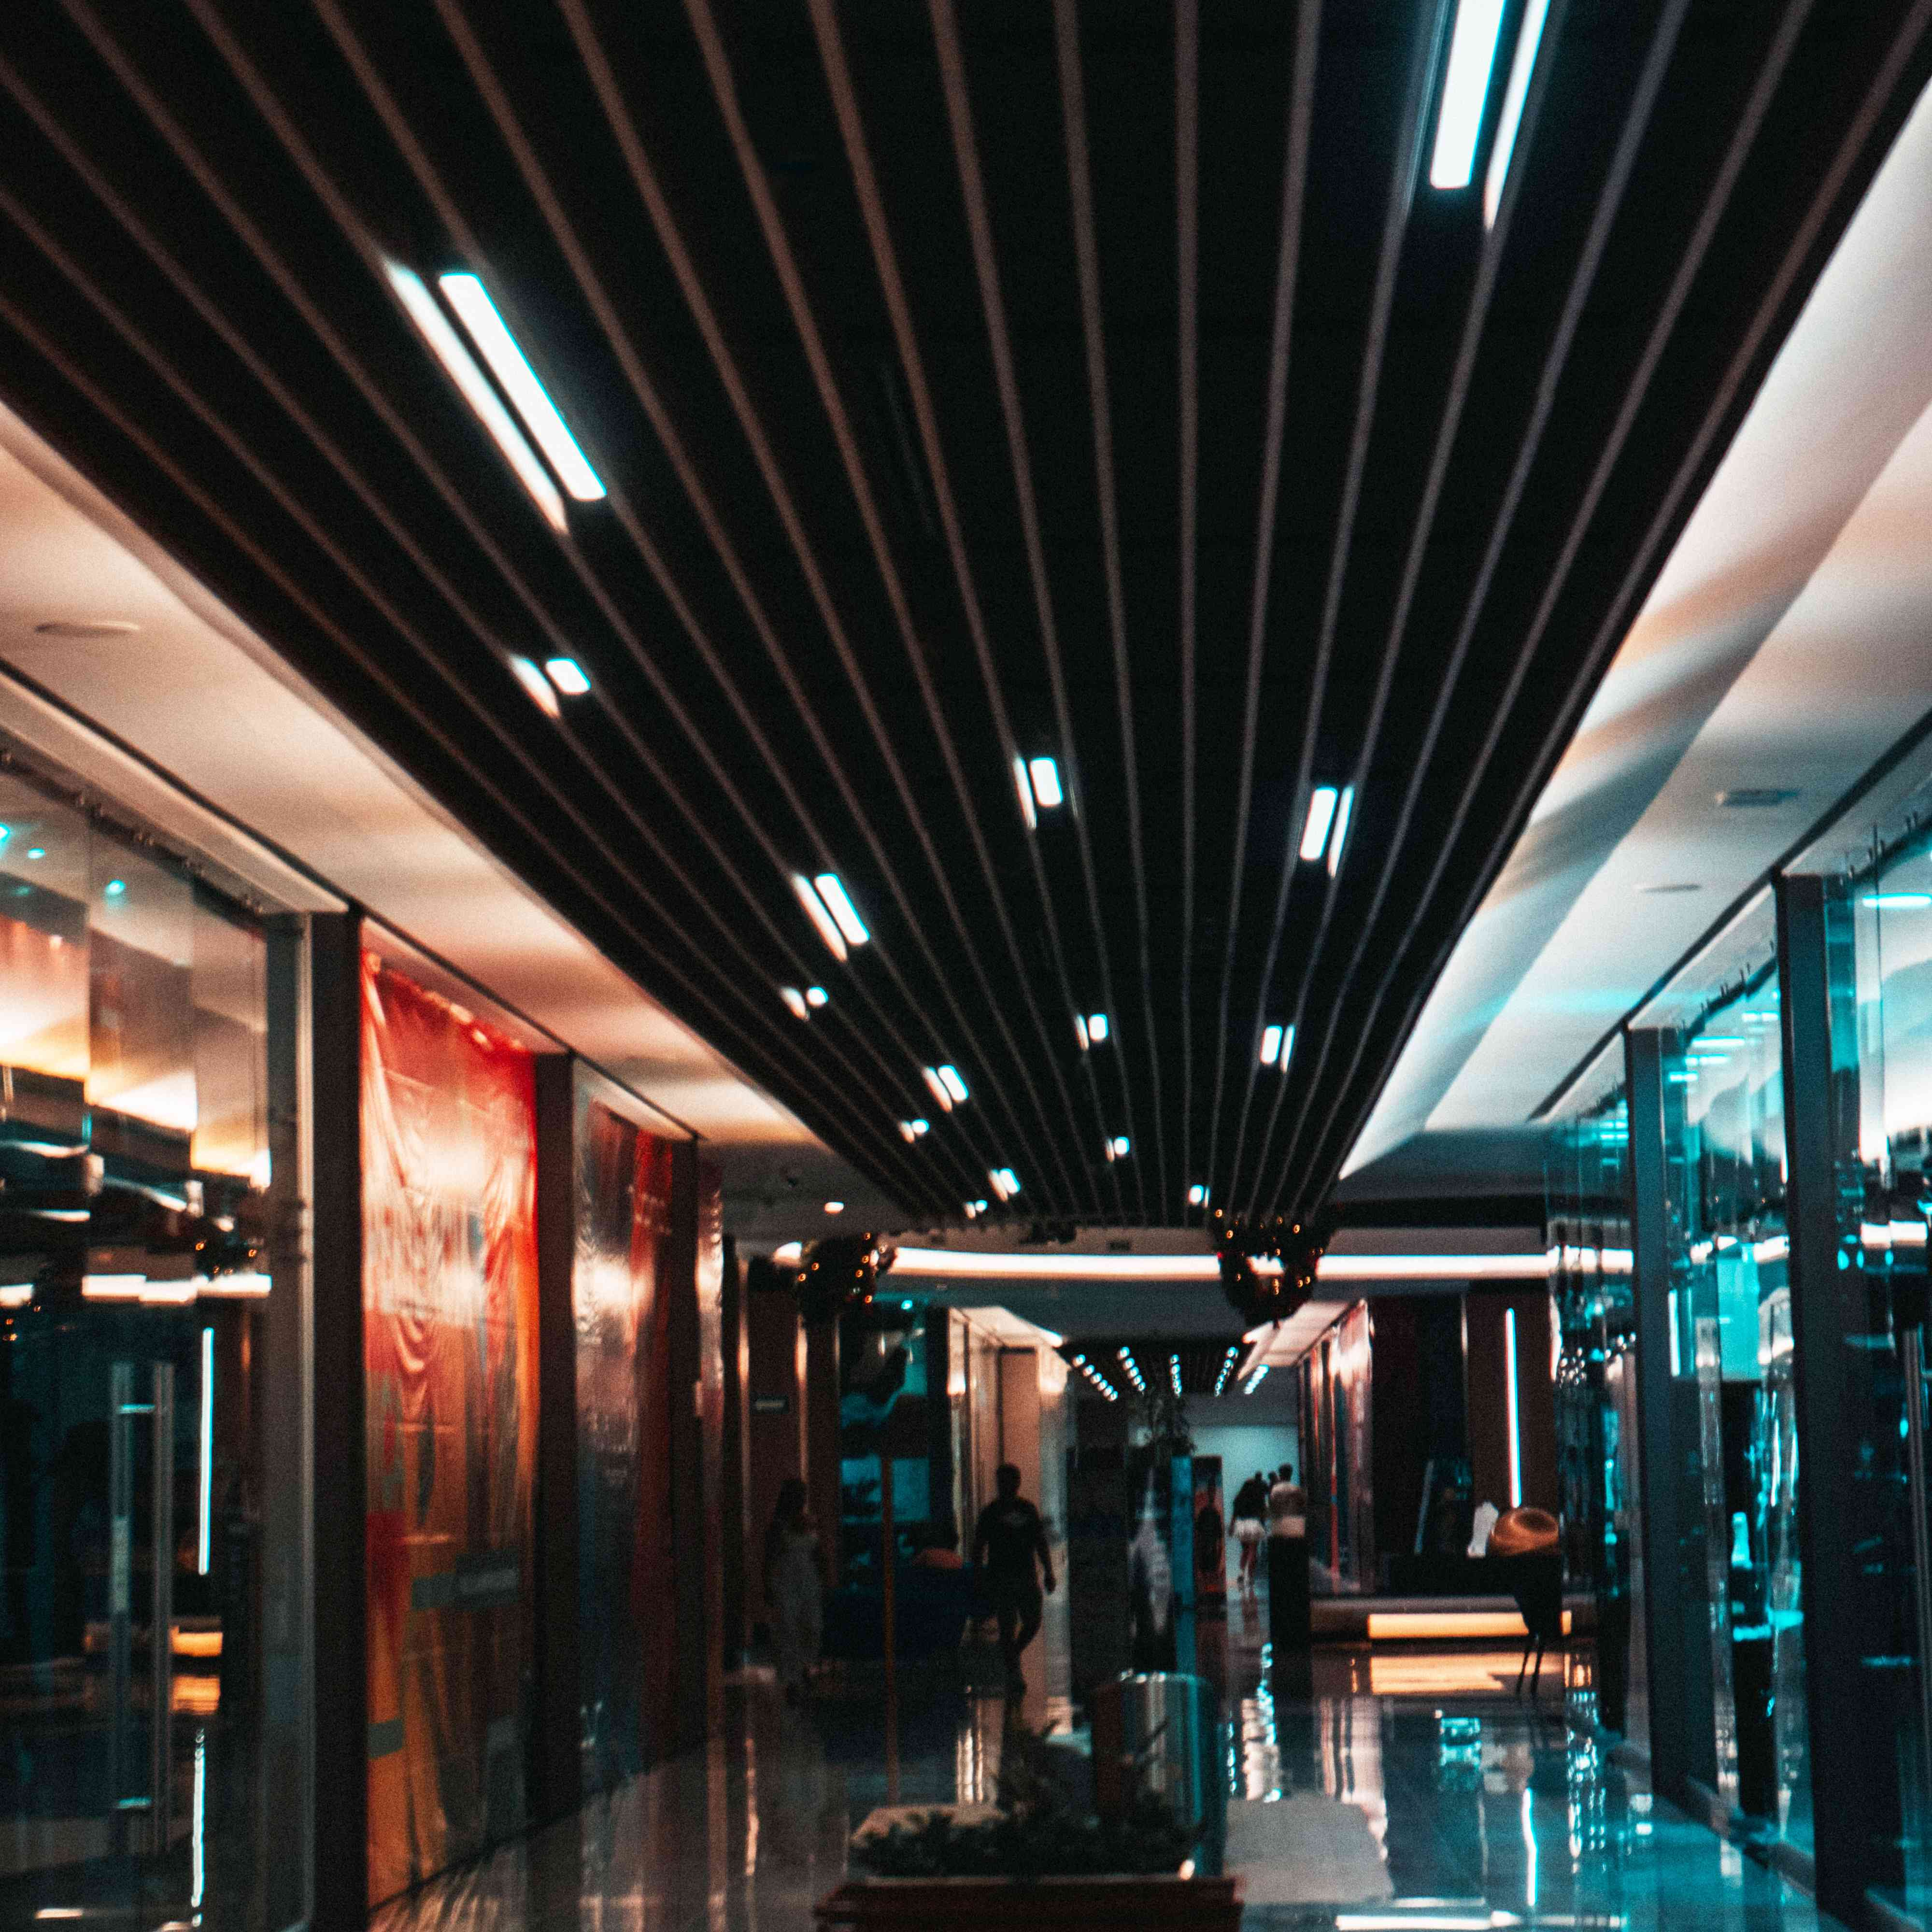 Inside hallway of Luxury Avenue shopping mall